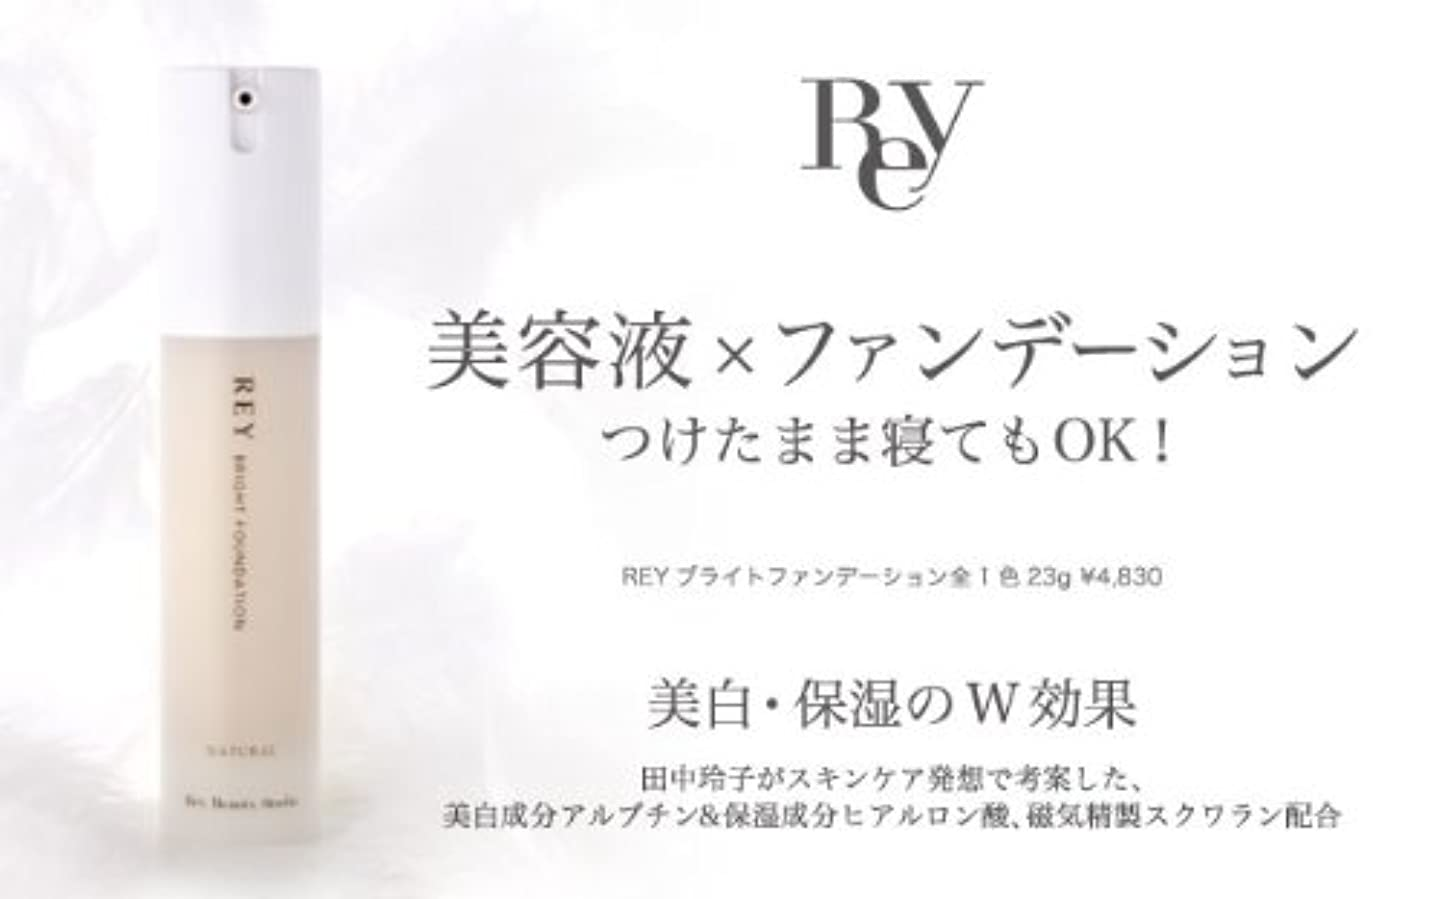 REY レイ ブライトファンデーション 23g ライトナチュラル 【リキッド】